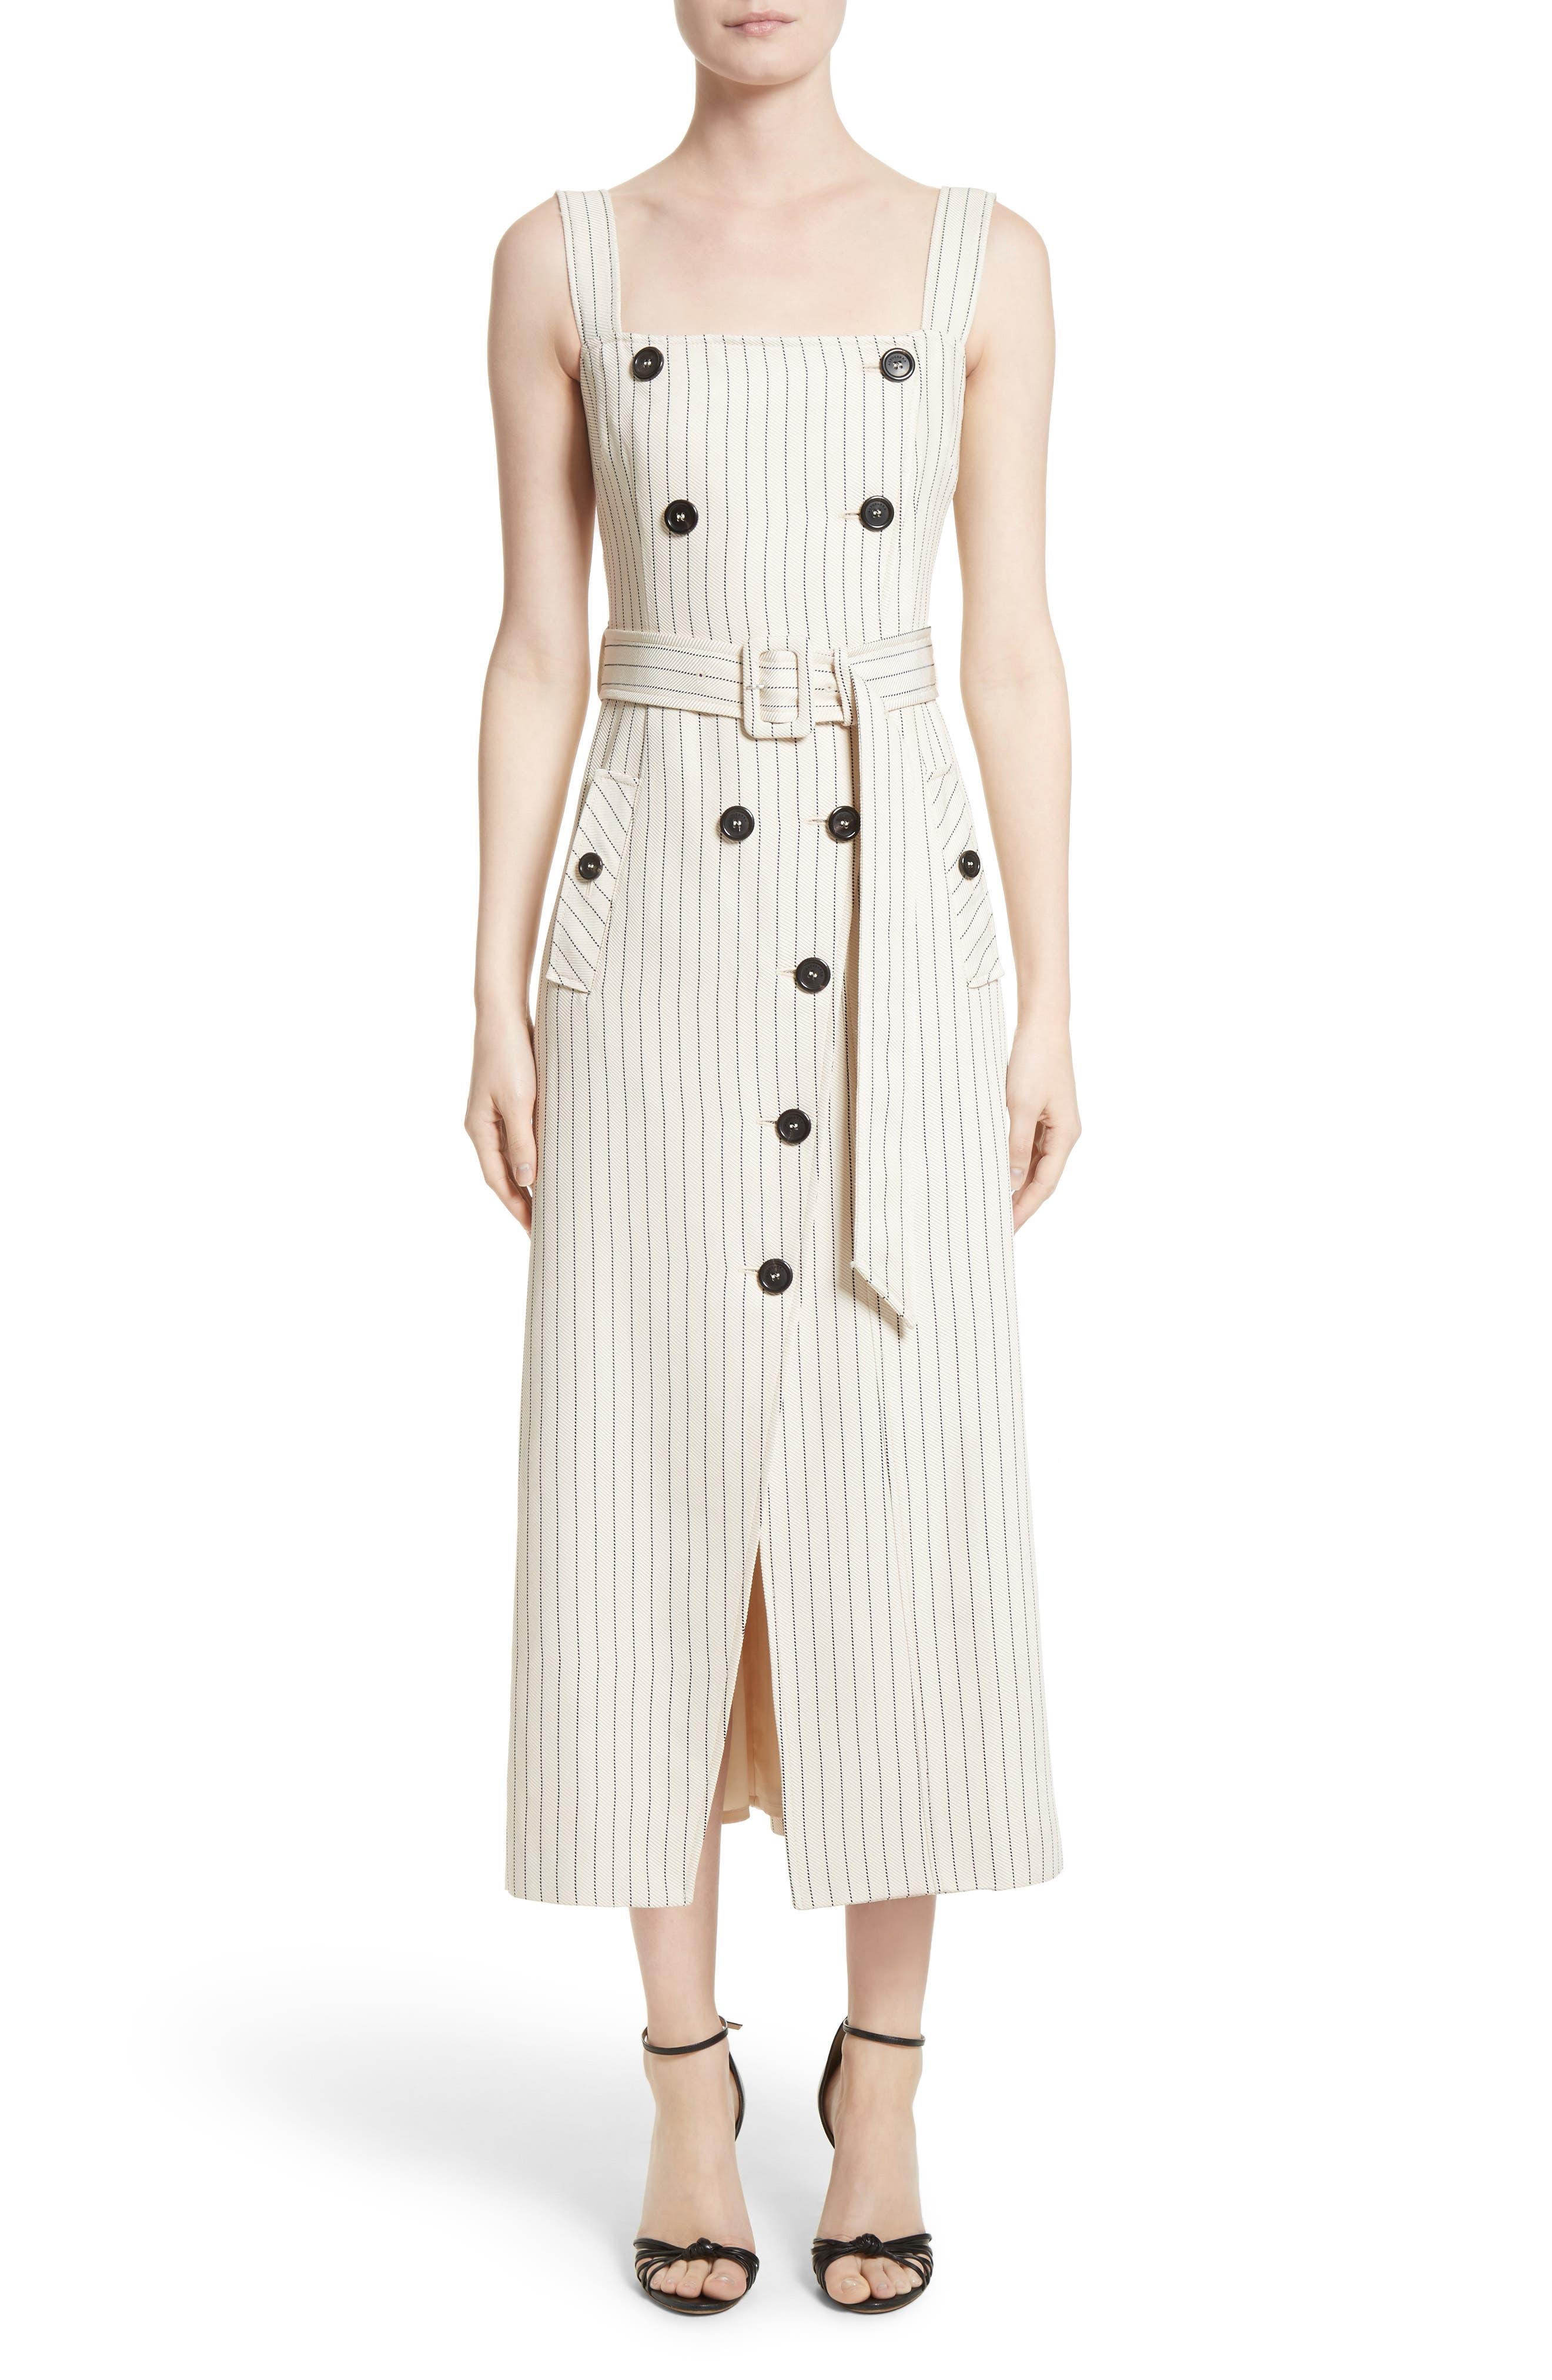 Main Image - Altuzarra Audrey Button Detail Pinstripe Dress